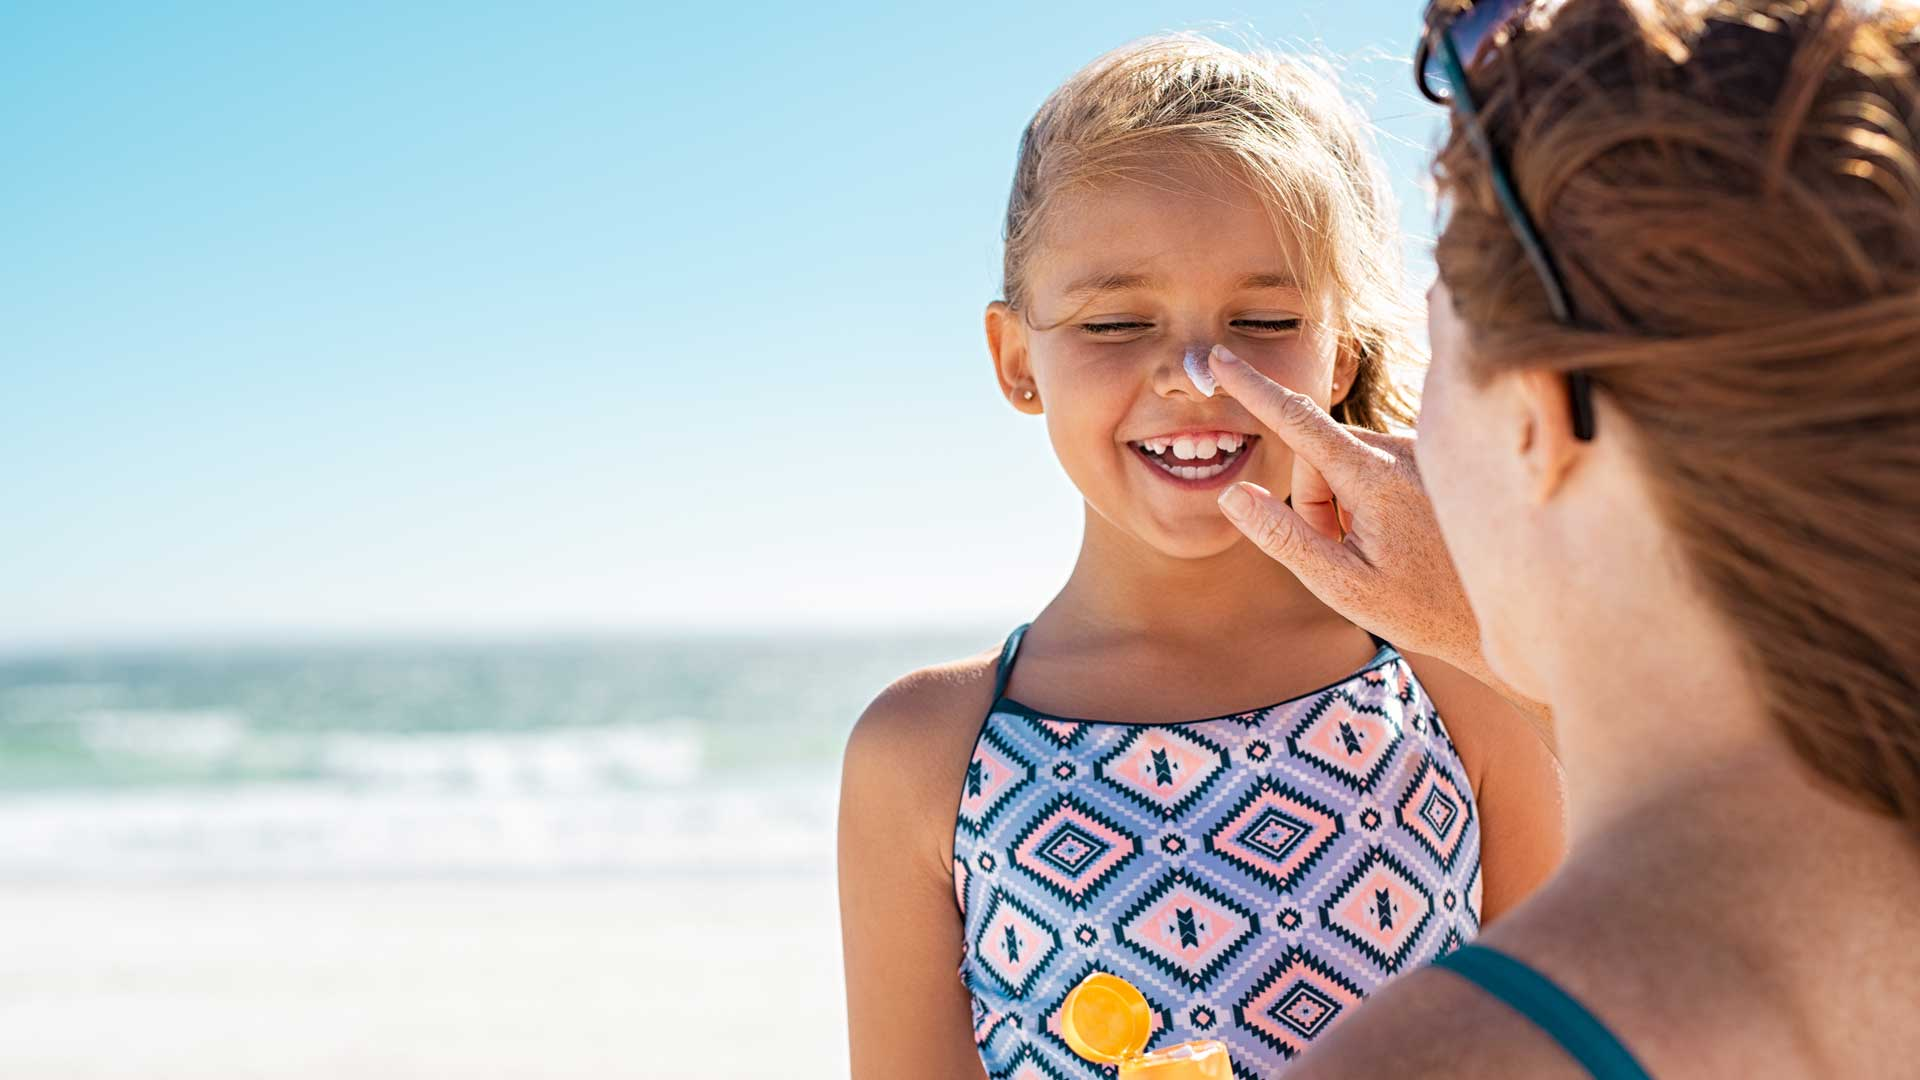 Sonnencreme am Strand mit Kind